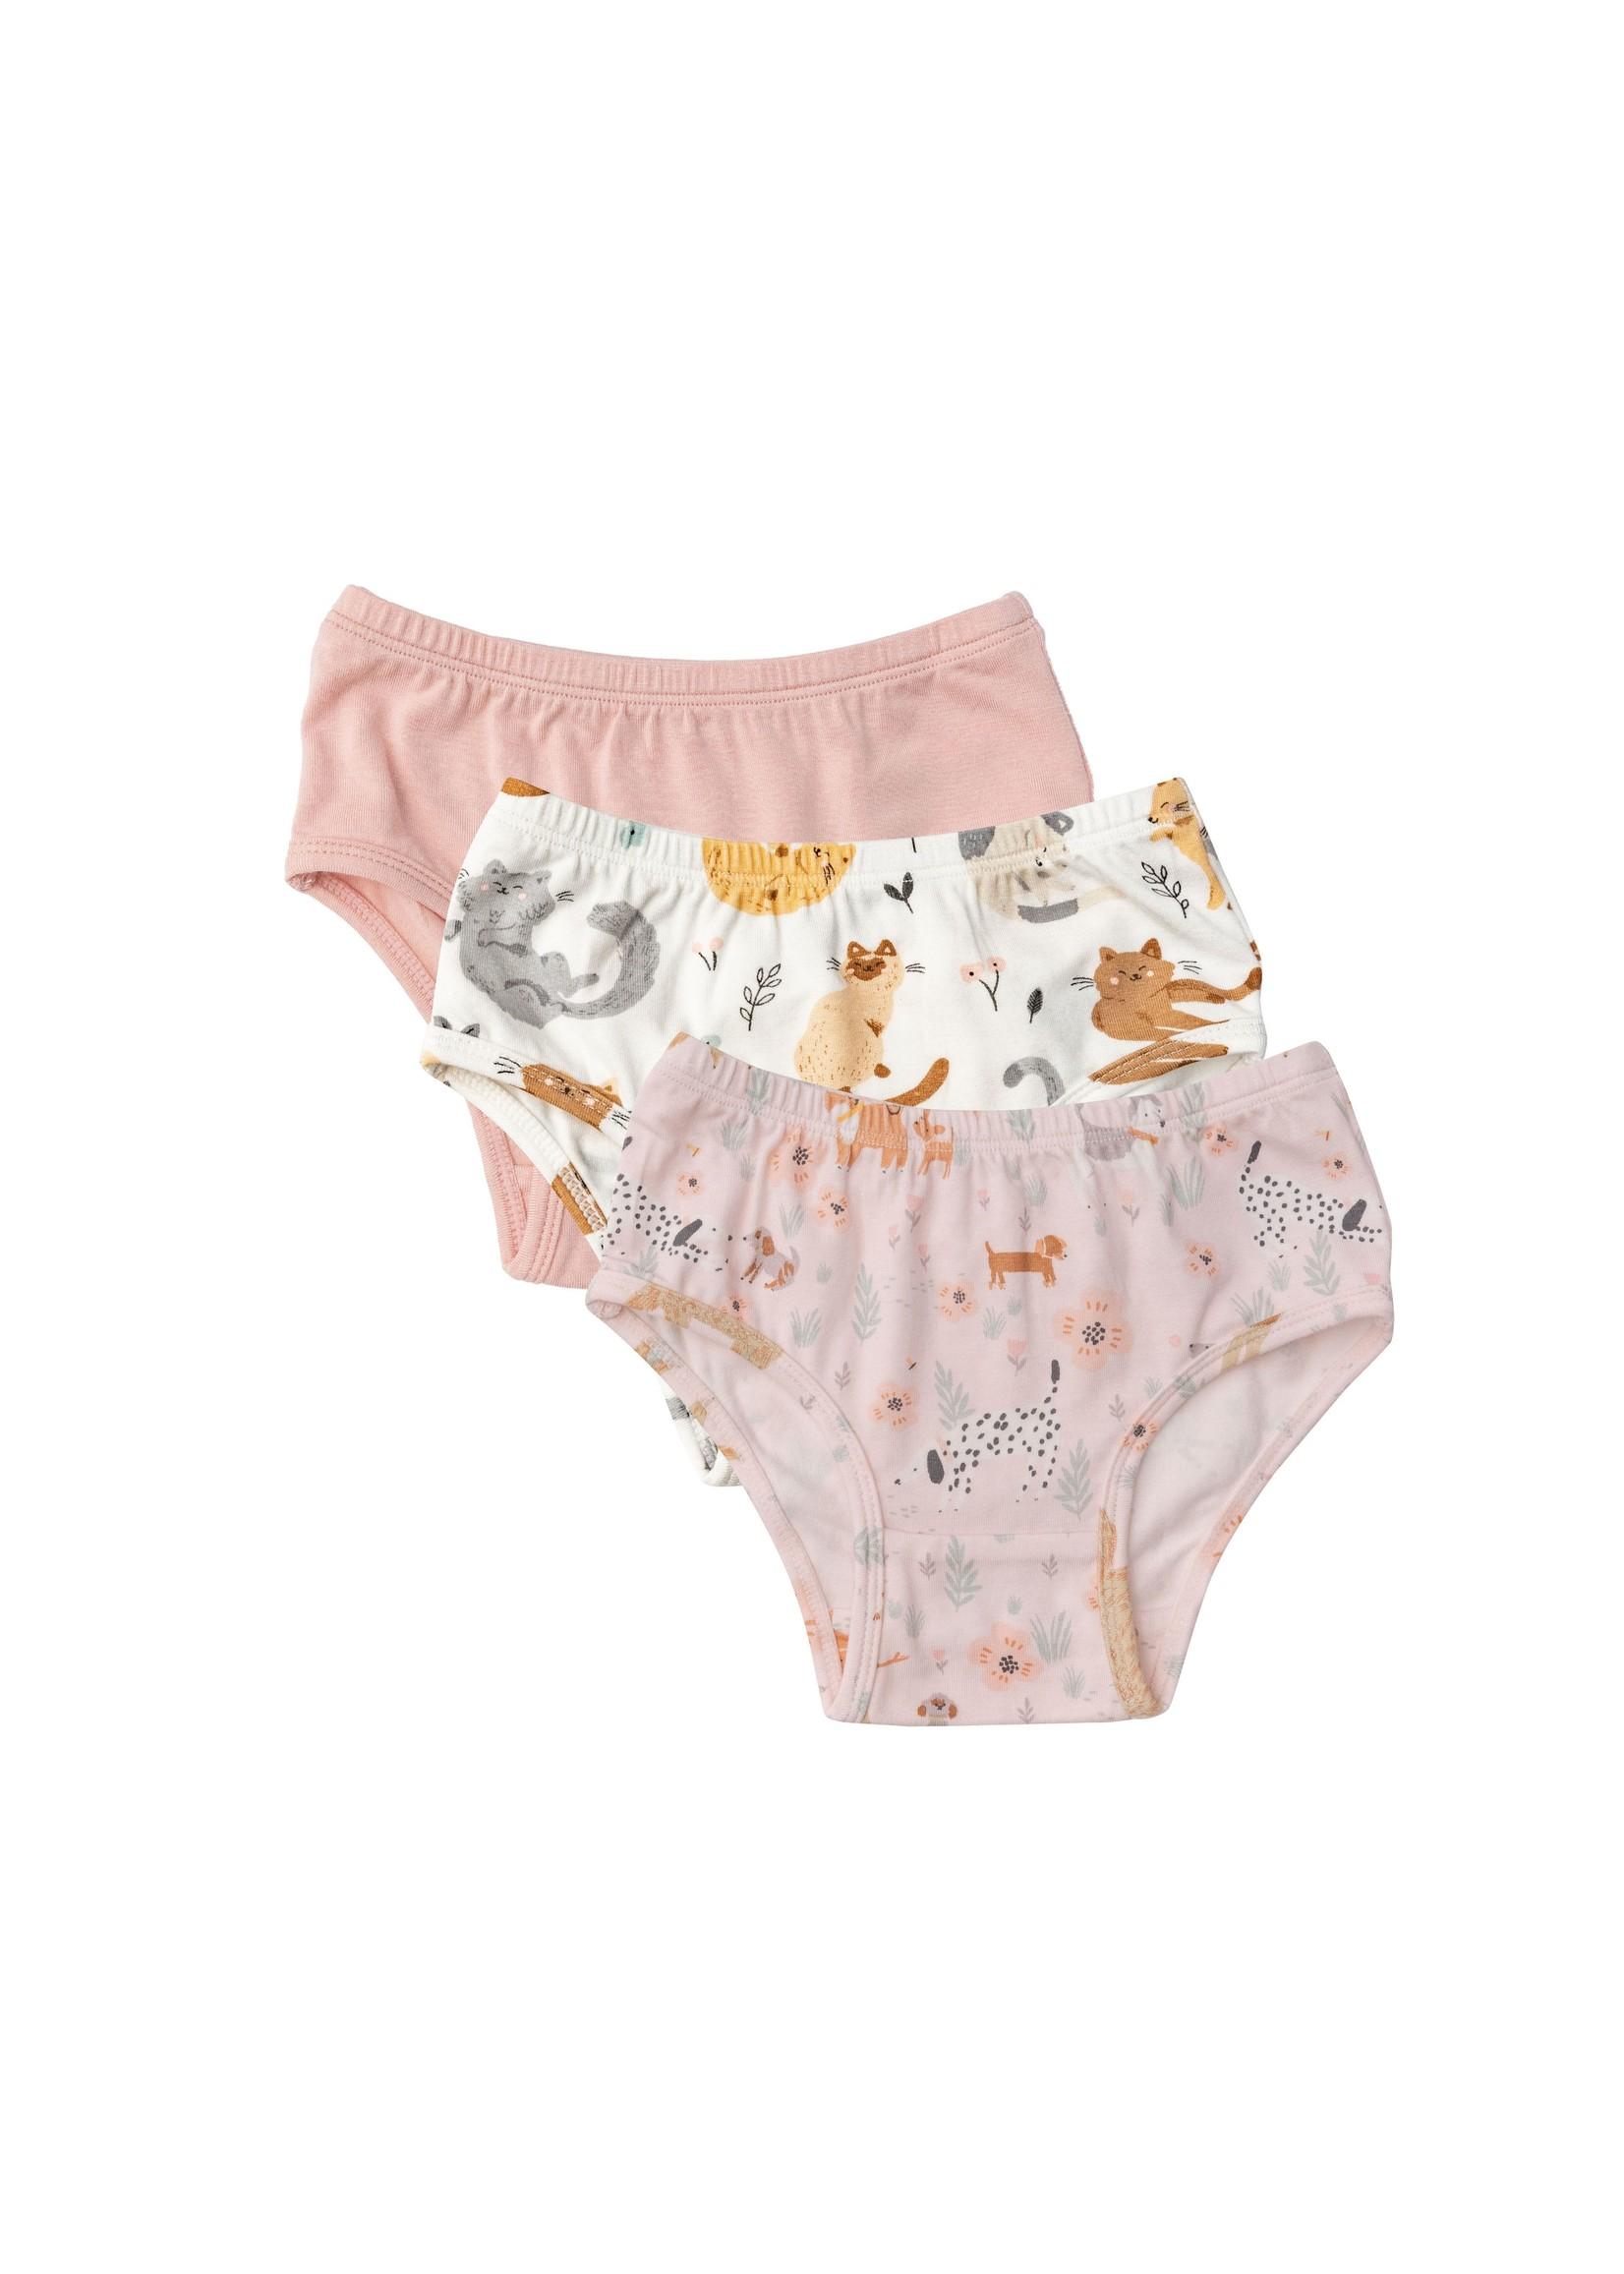 Angel Dear 3 Pack Panty  Set Kitties/Puppies